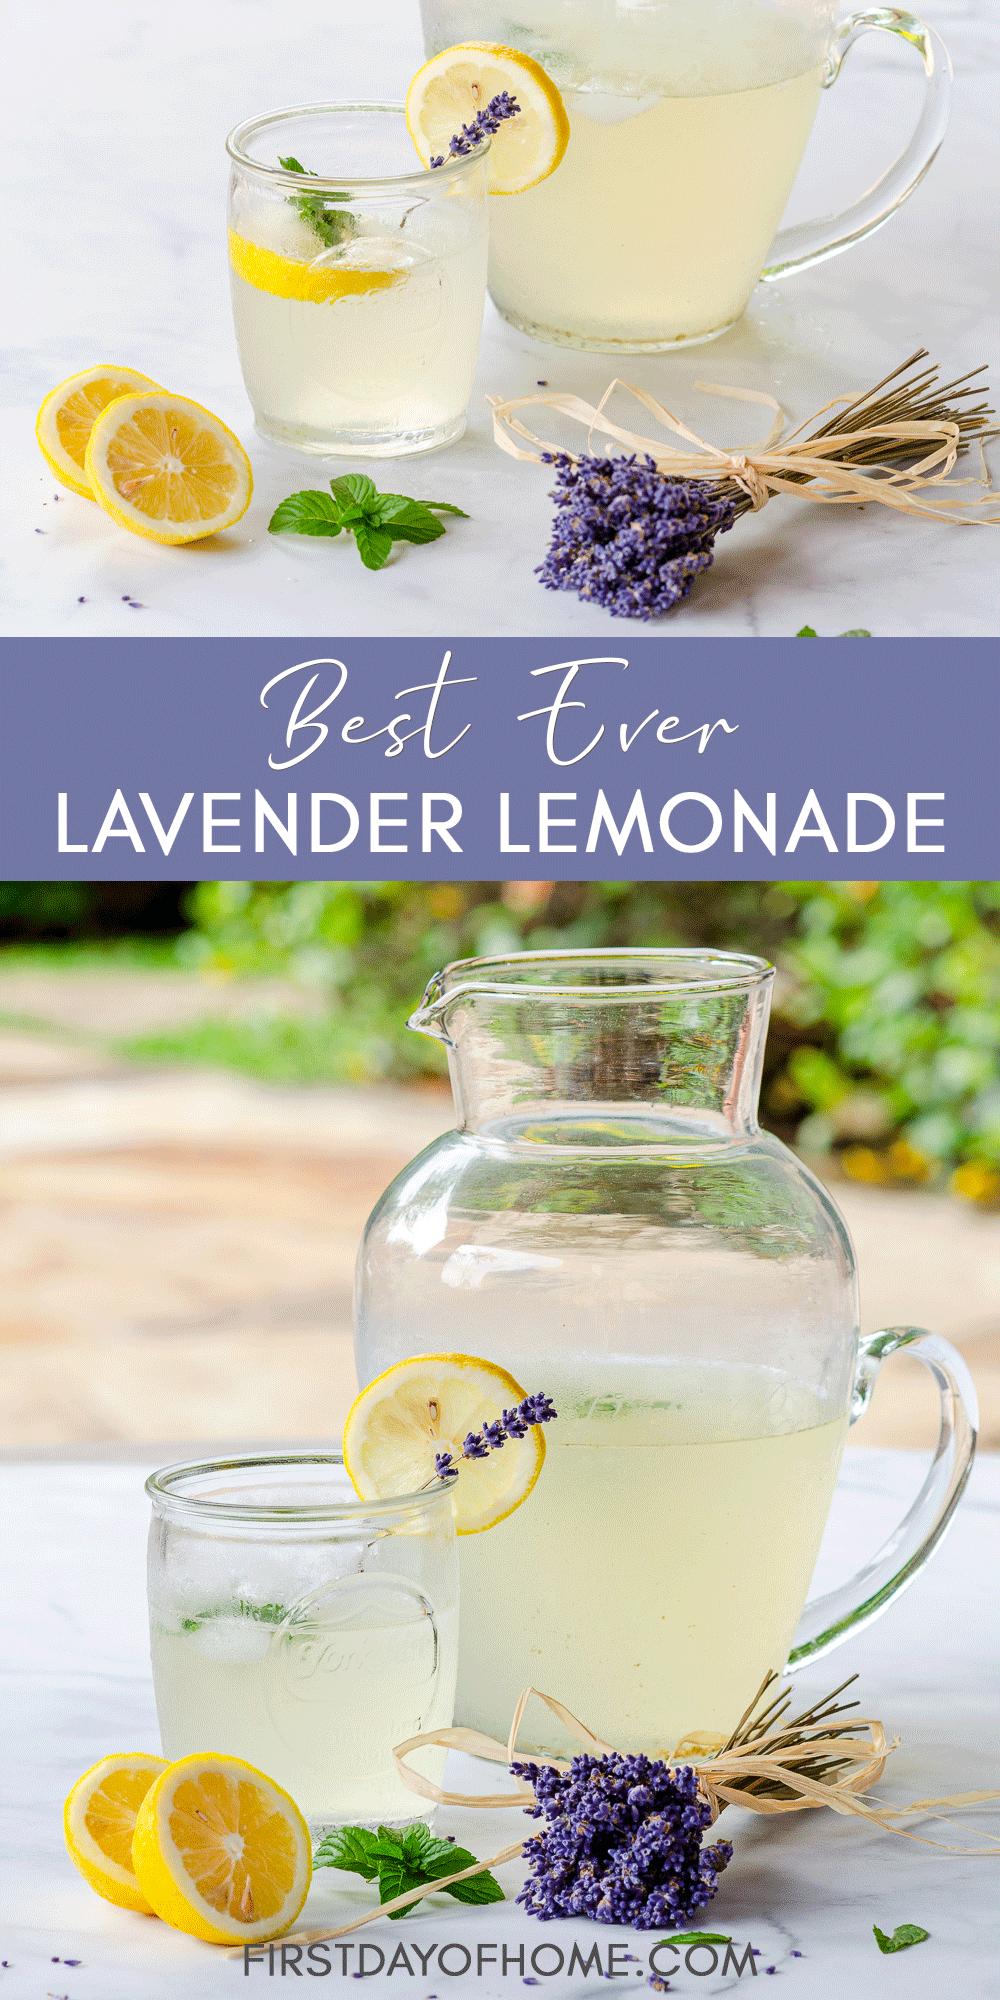 Lavender lemonade served in a pitcher with garnish of dried lavender buds, lemon slices and mint